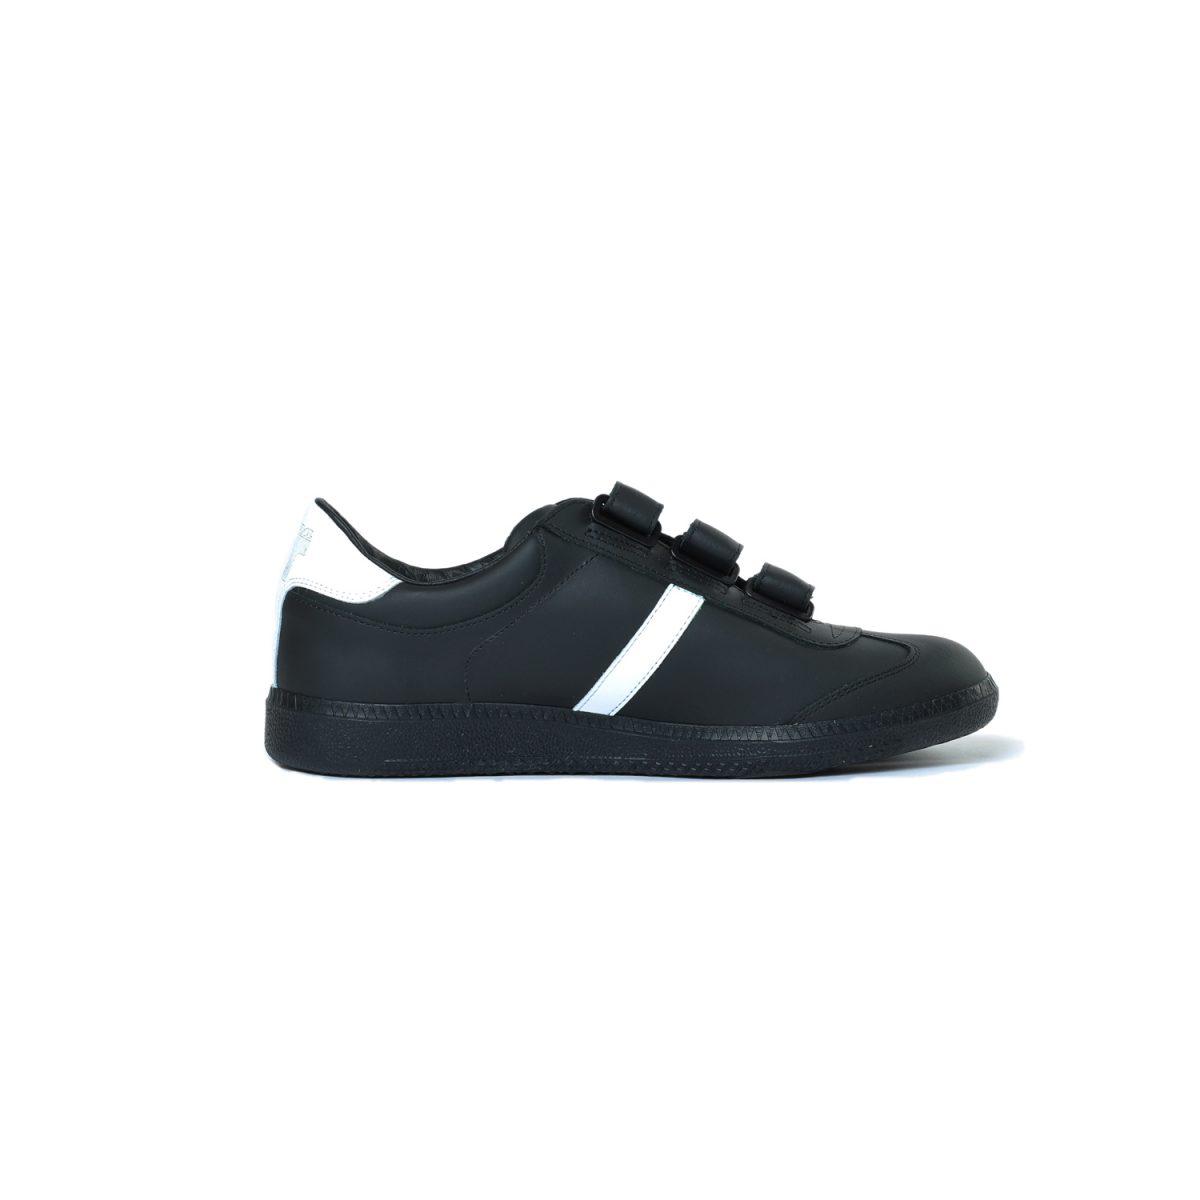 Tisza cipő - Compakt Delux - Fekete-fehér jubileumi